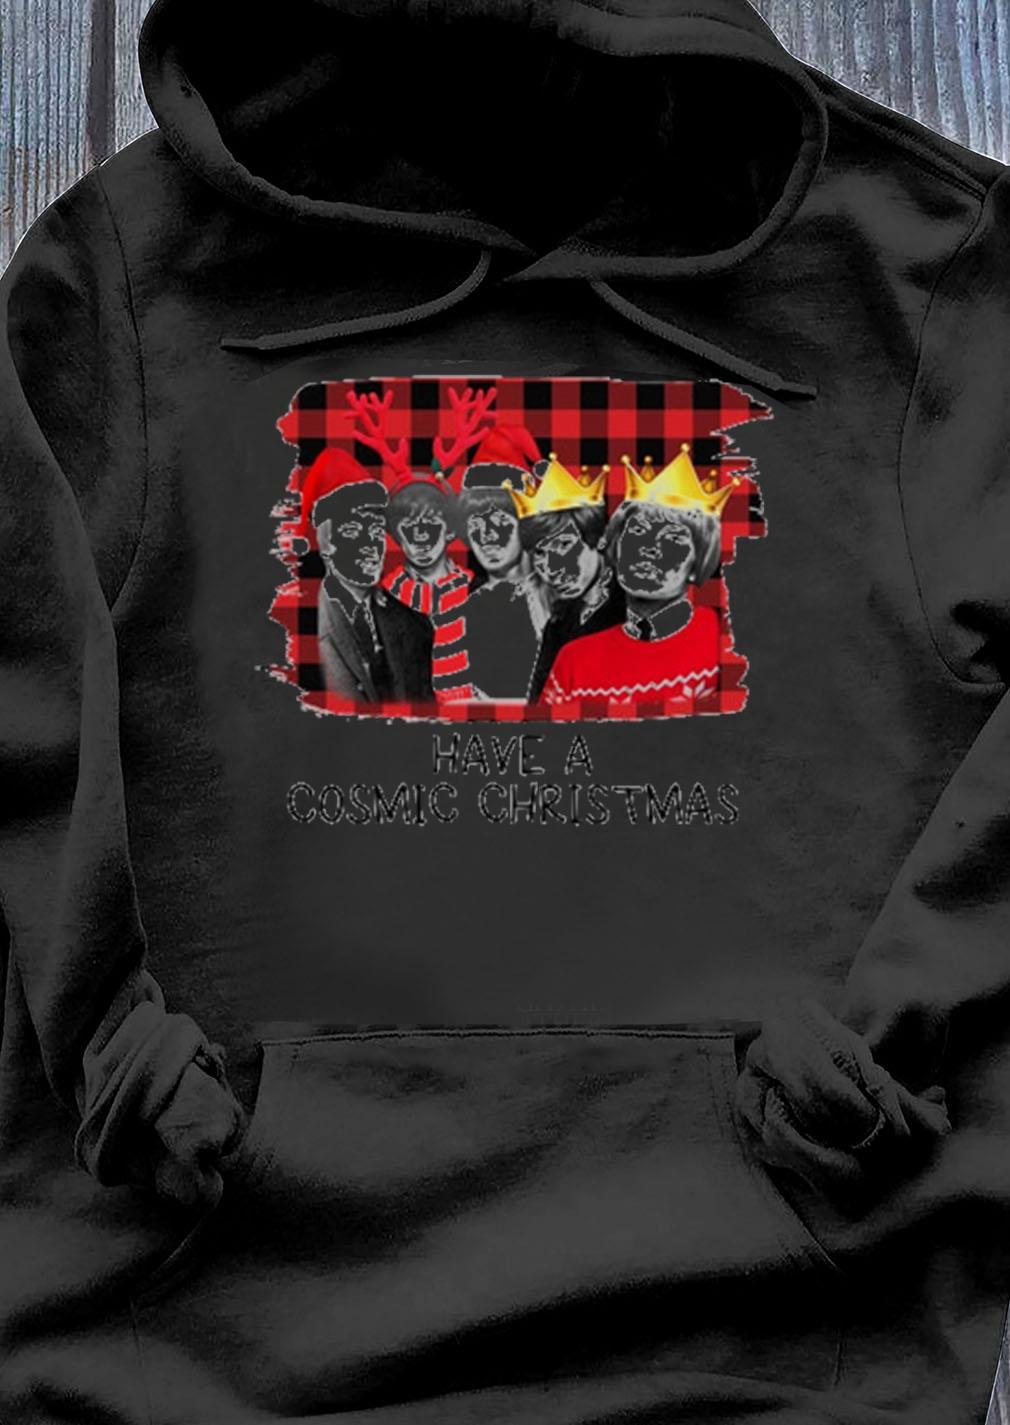 Rolling Stones Santa Hat Have A Cosmic Christmas Sweater Hoodie